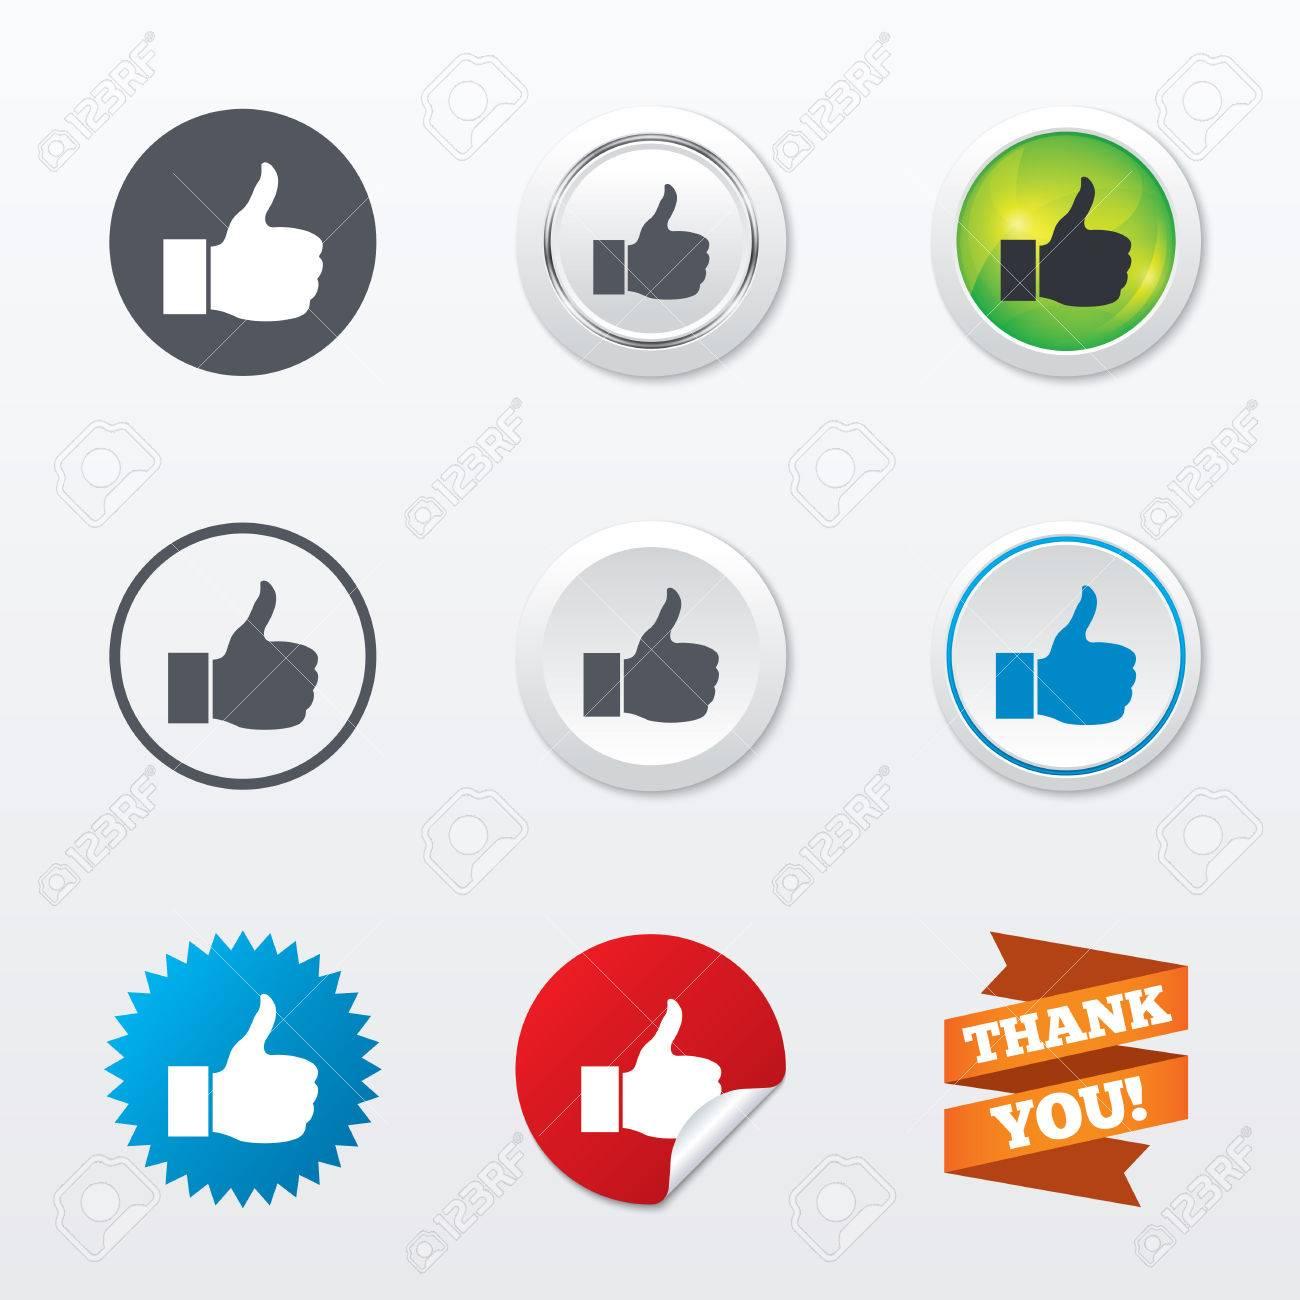 like sign icon thumb up sign hand finger up symbol circle